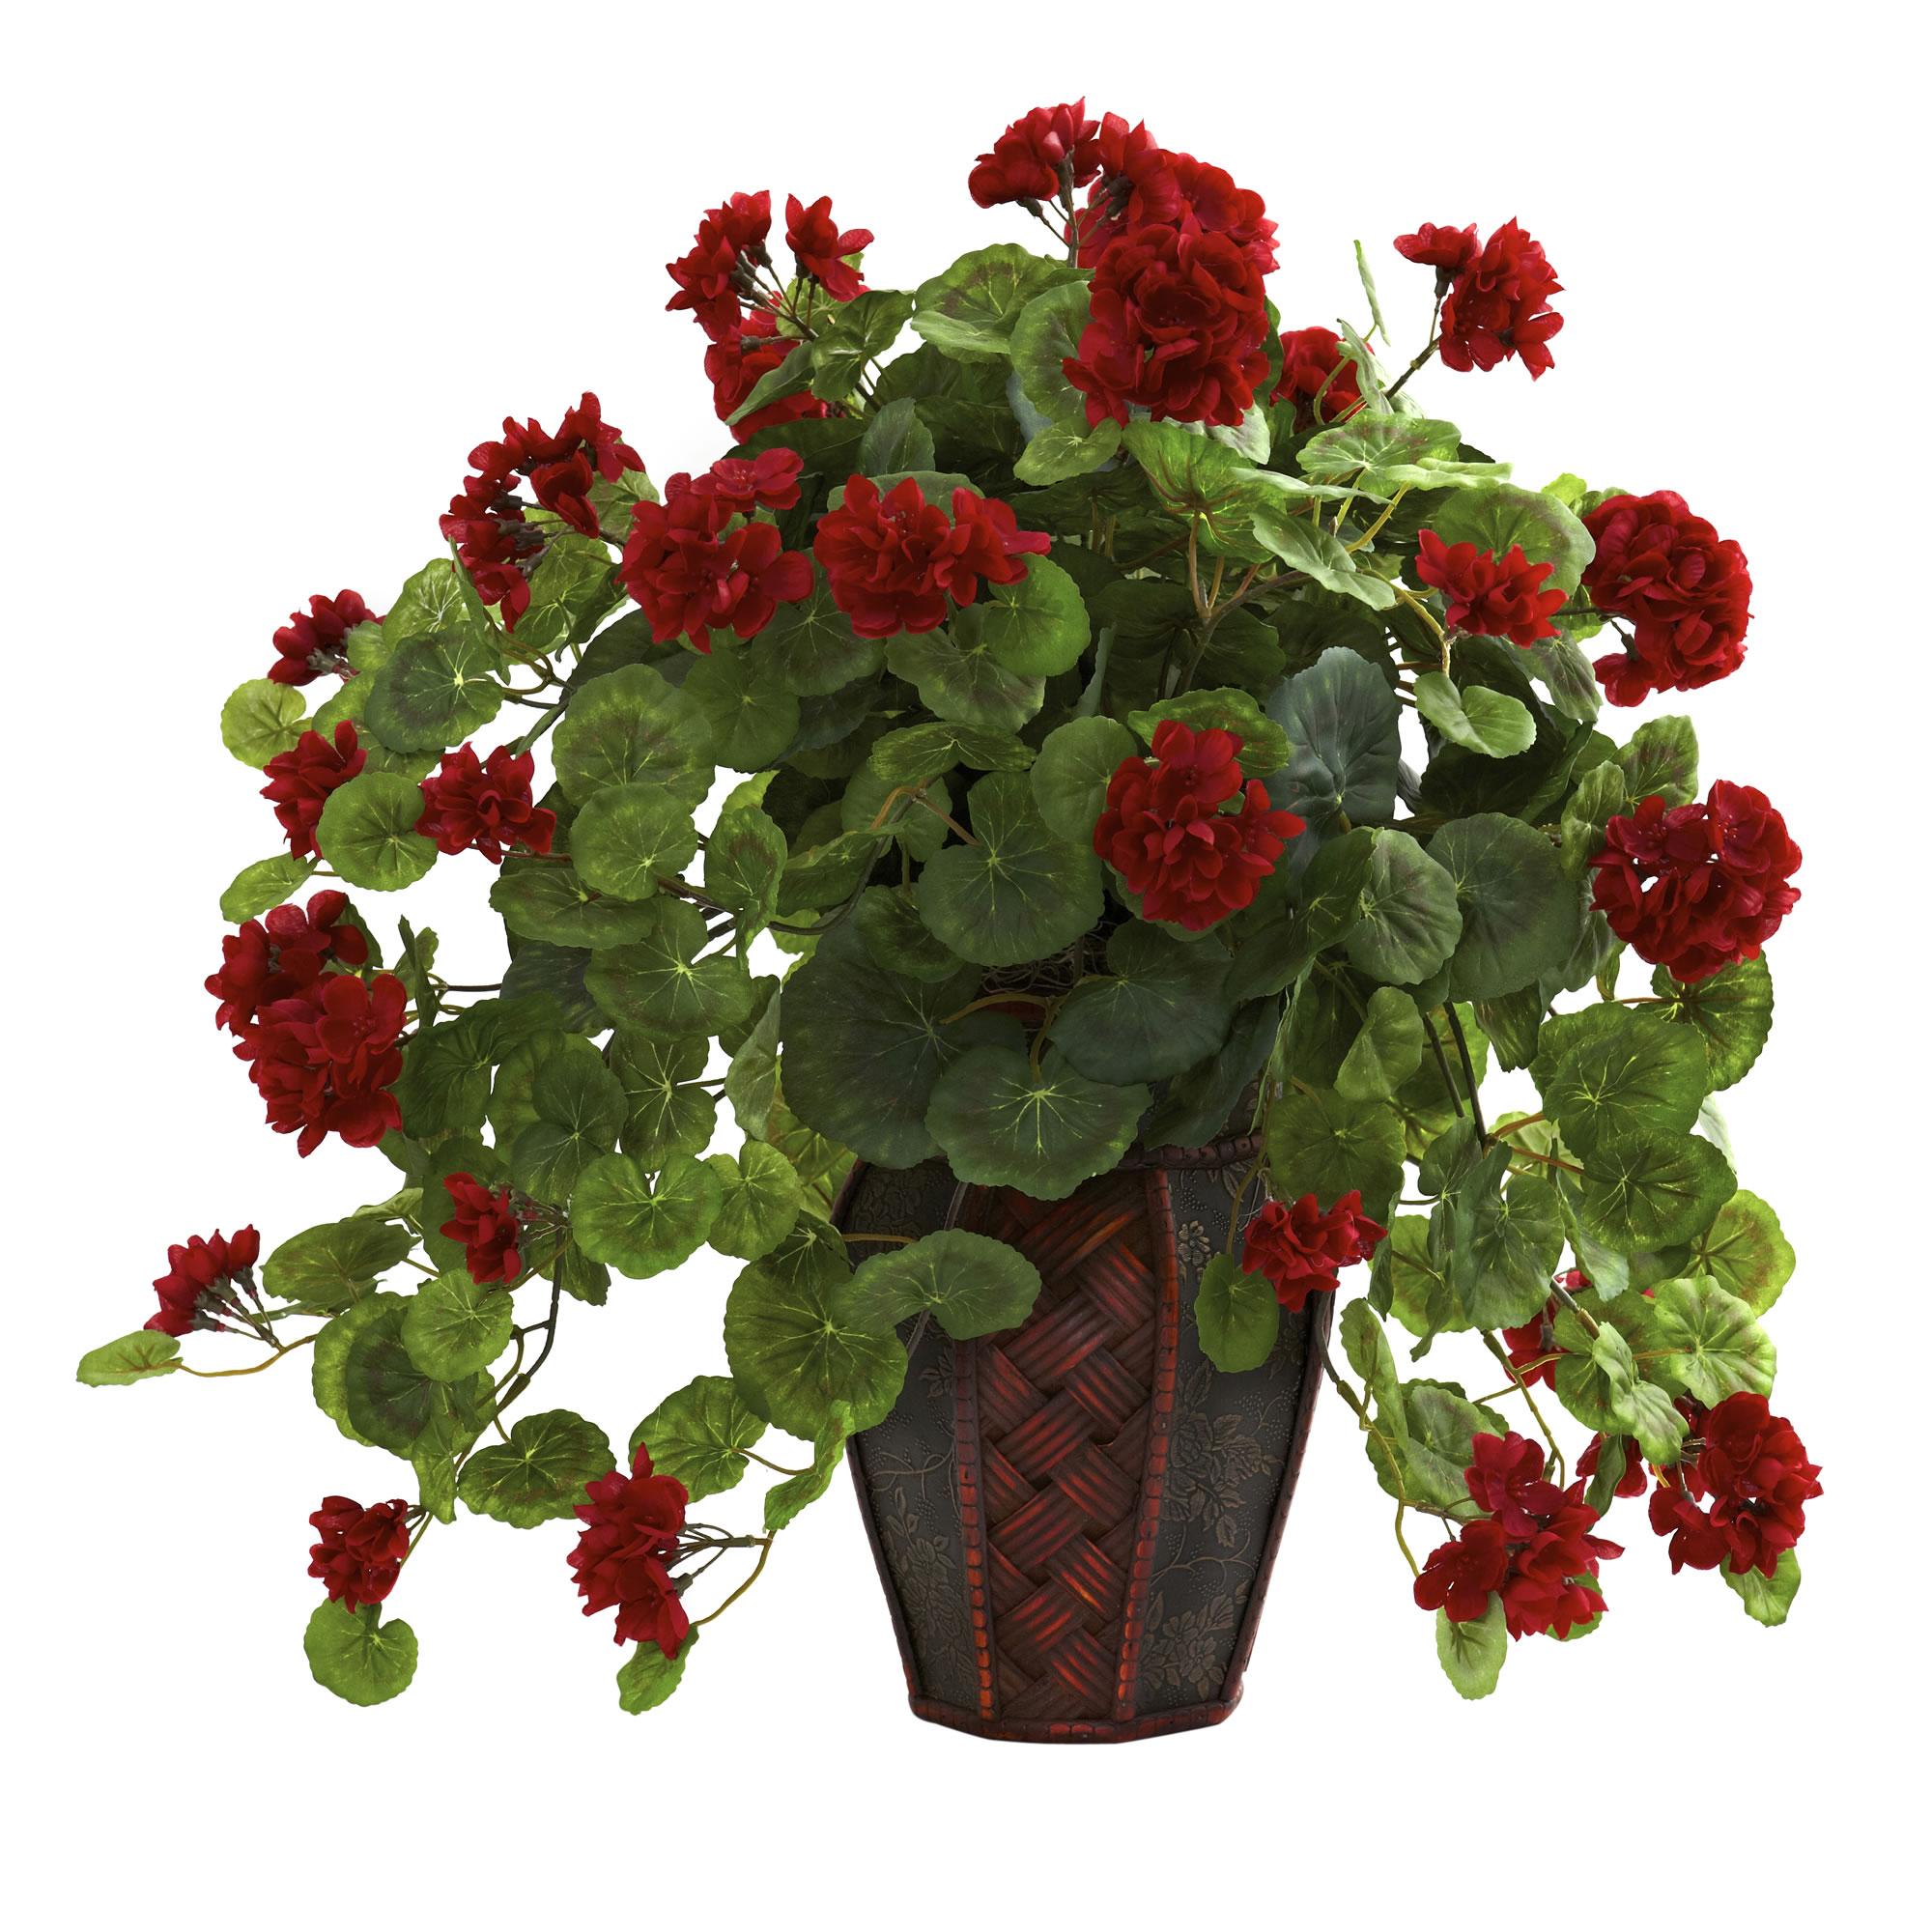 Geranium With Decorative Planter PartNumber: 02473984000P KsnValue: 6089021 MfgPartNumber: 6777